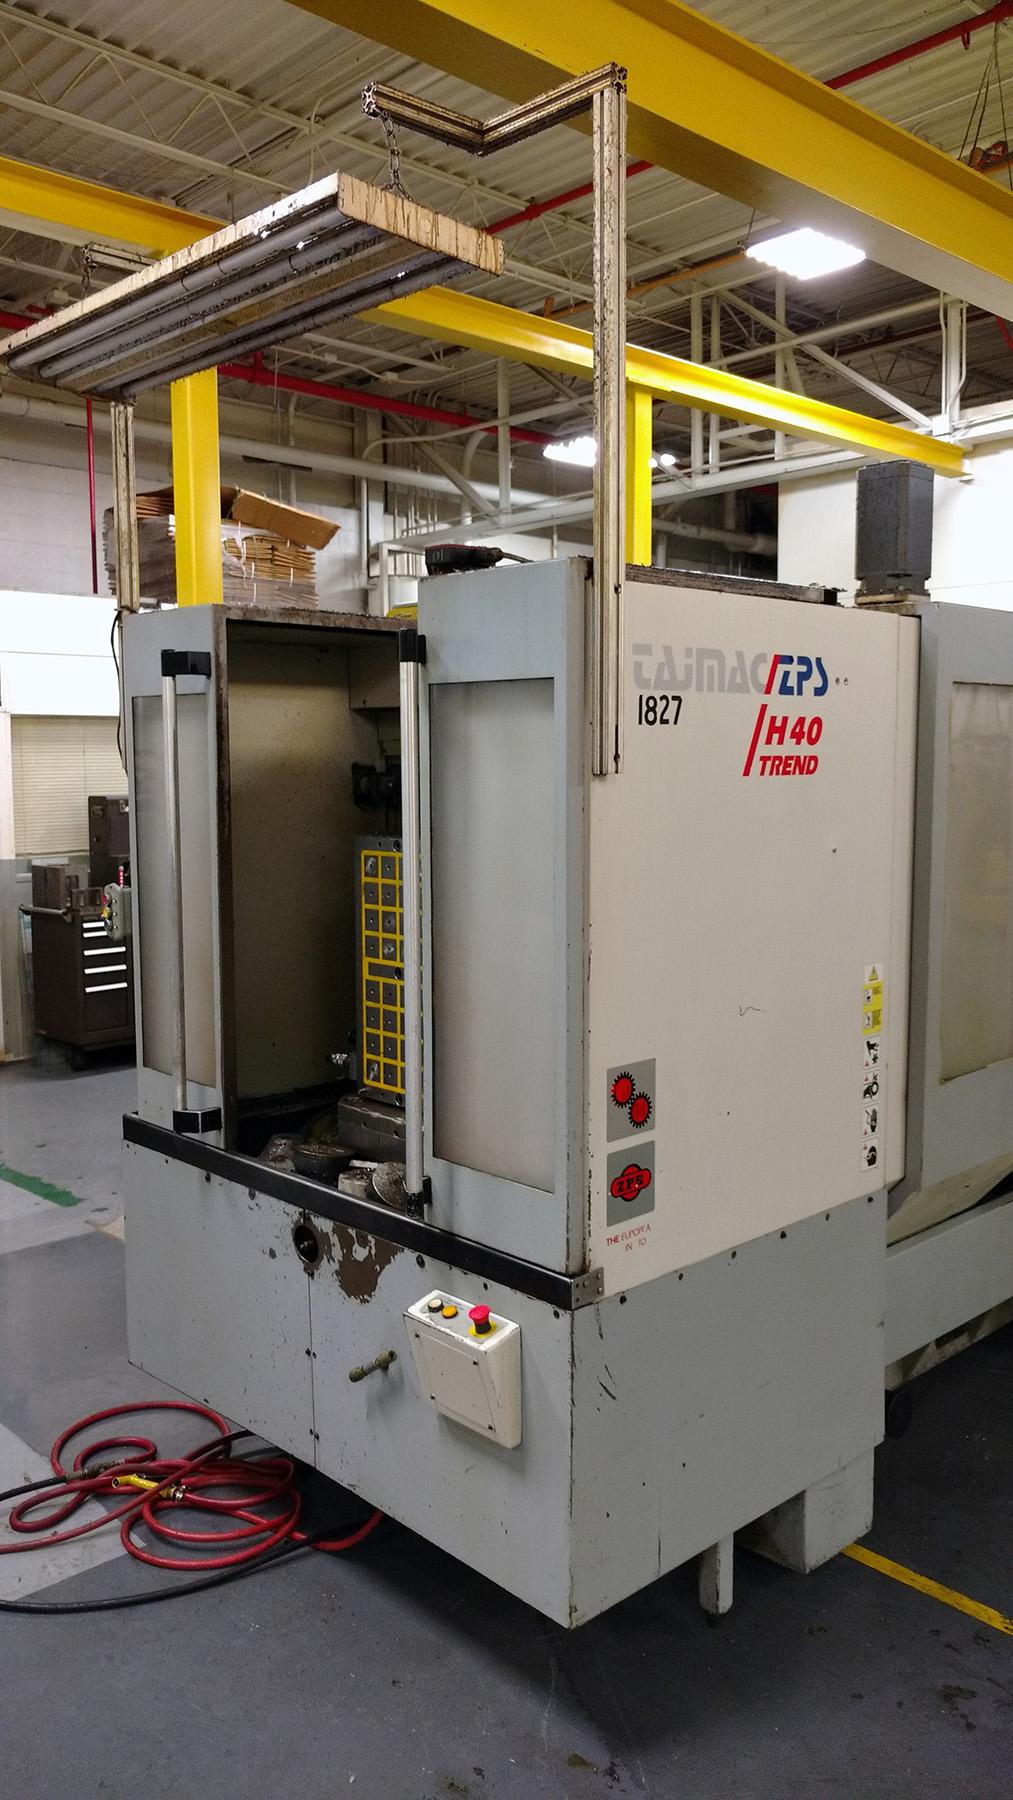 USED, TAJMAC - ZPS H40 TREND CNC HORIZONTAL MACHINING CENTER